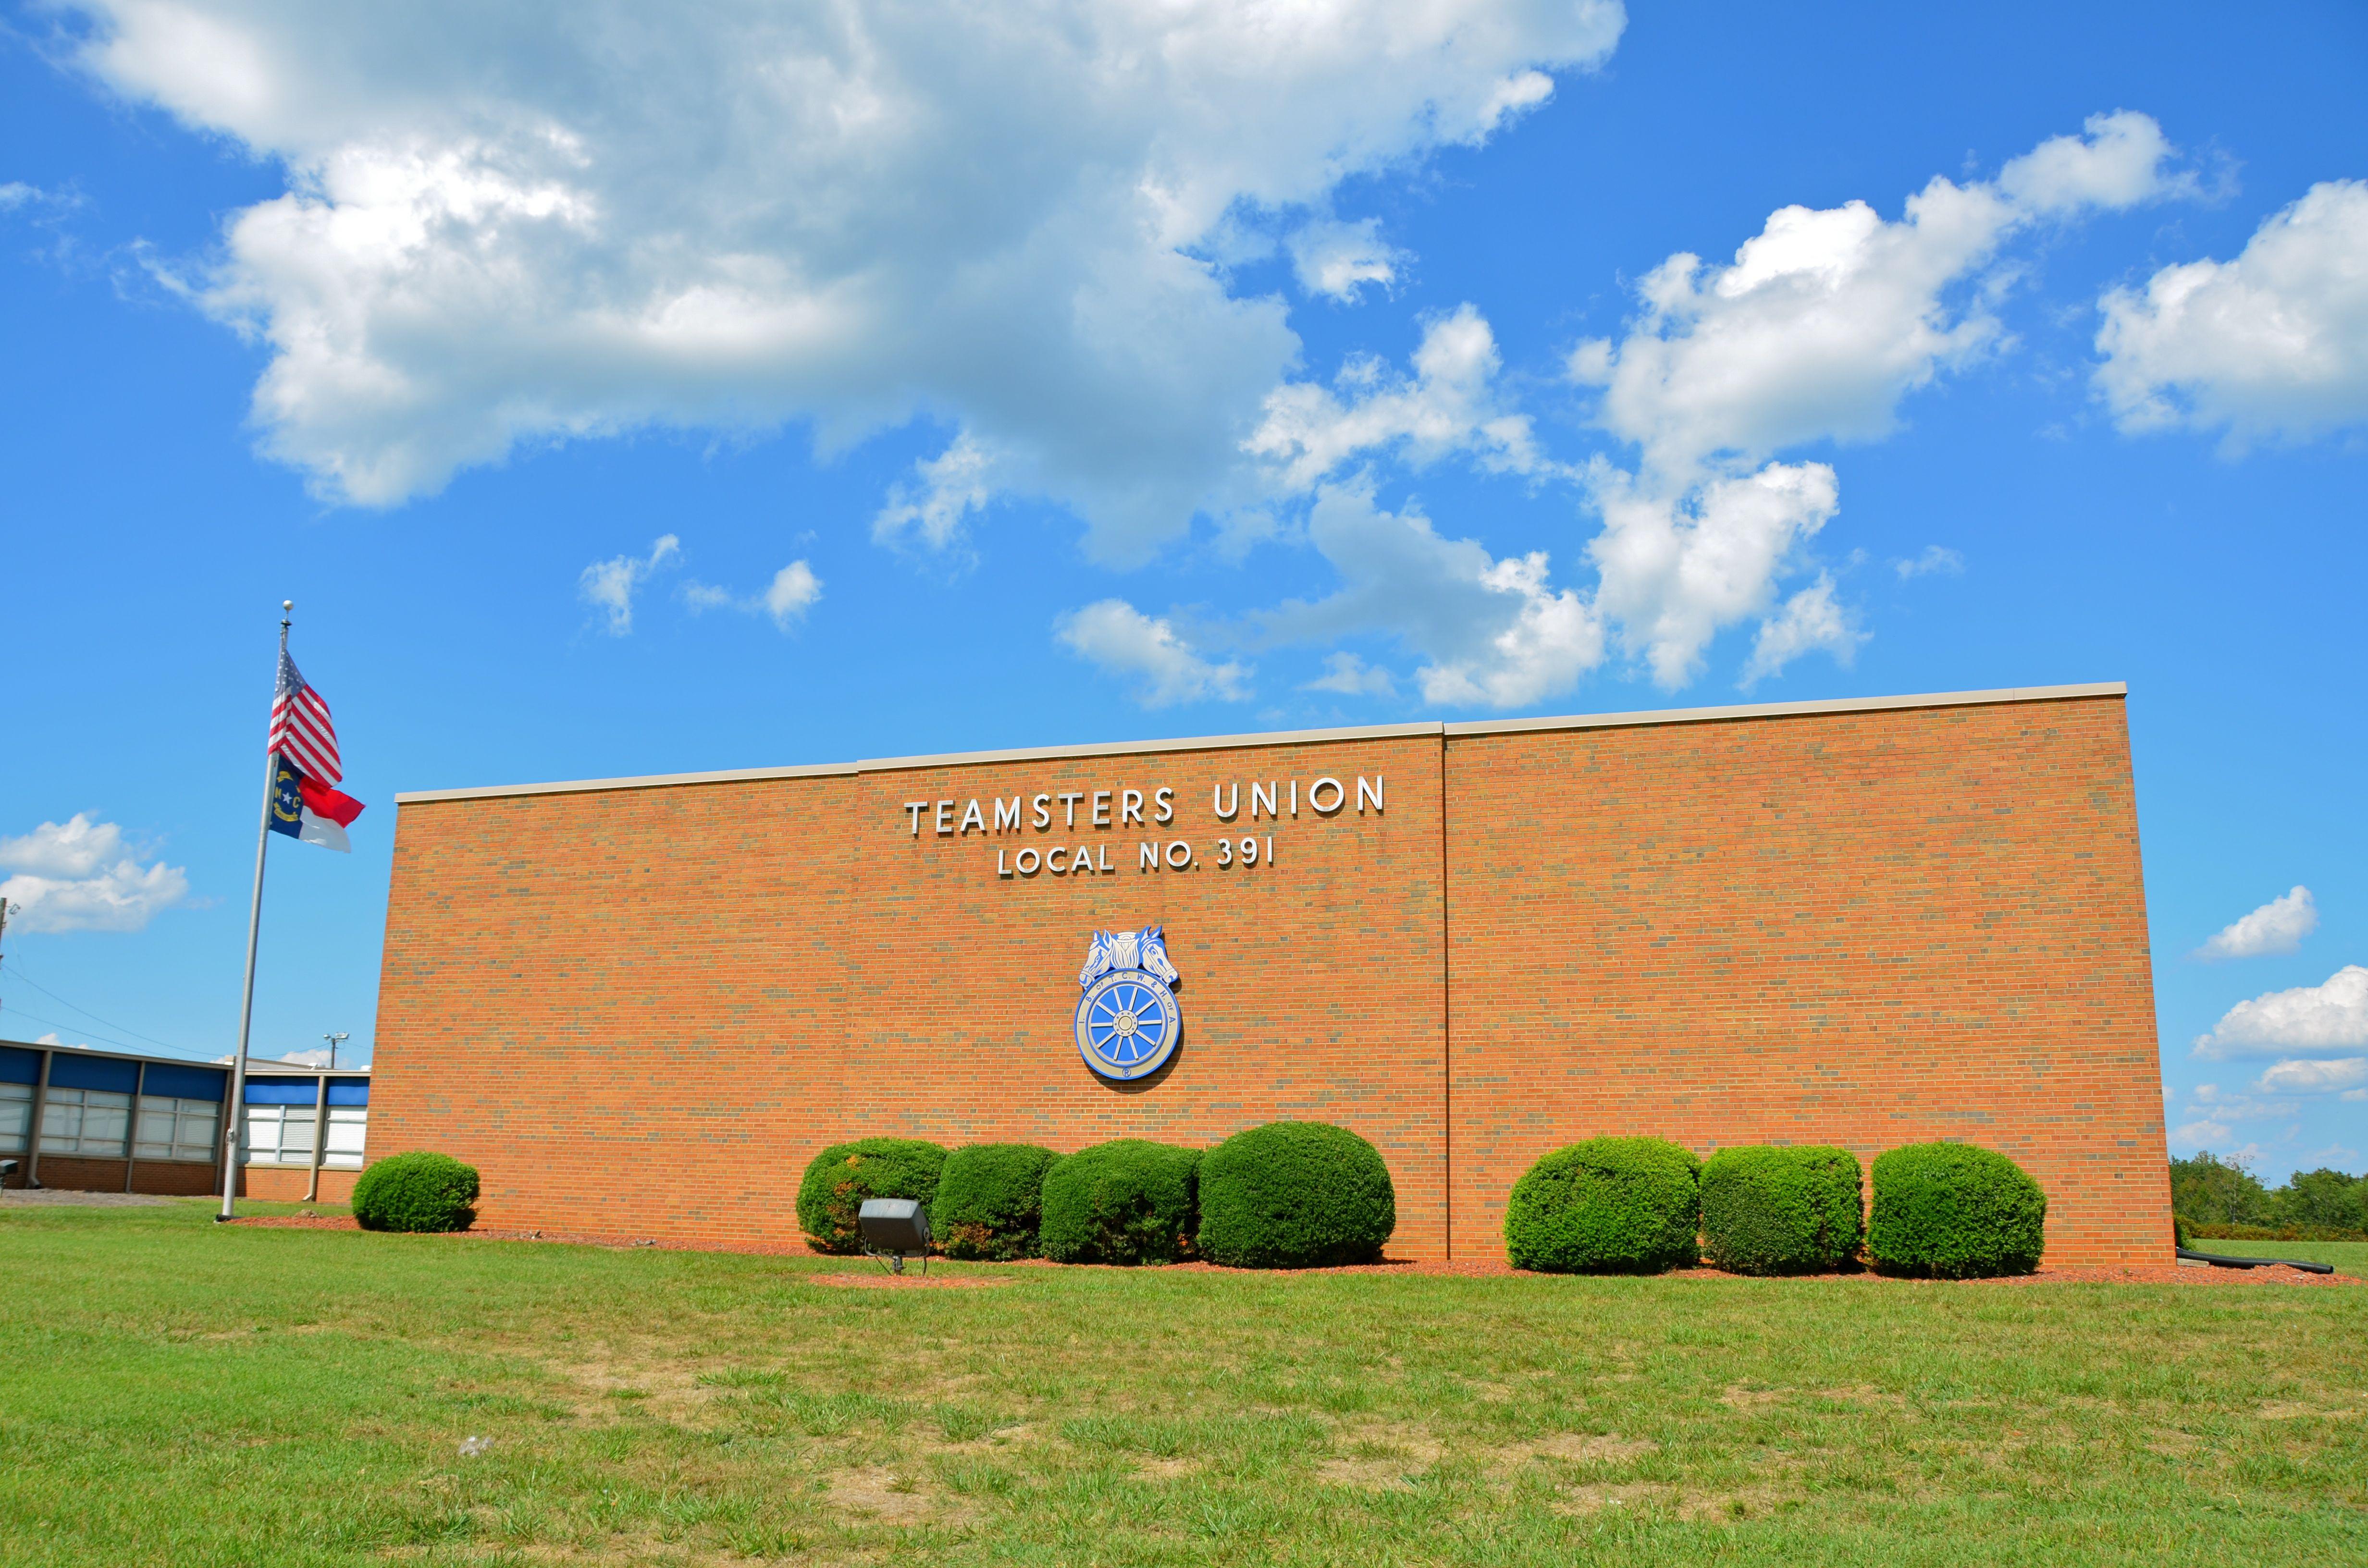 Teamsters Union 391 - Greensboro Daily Photo